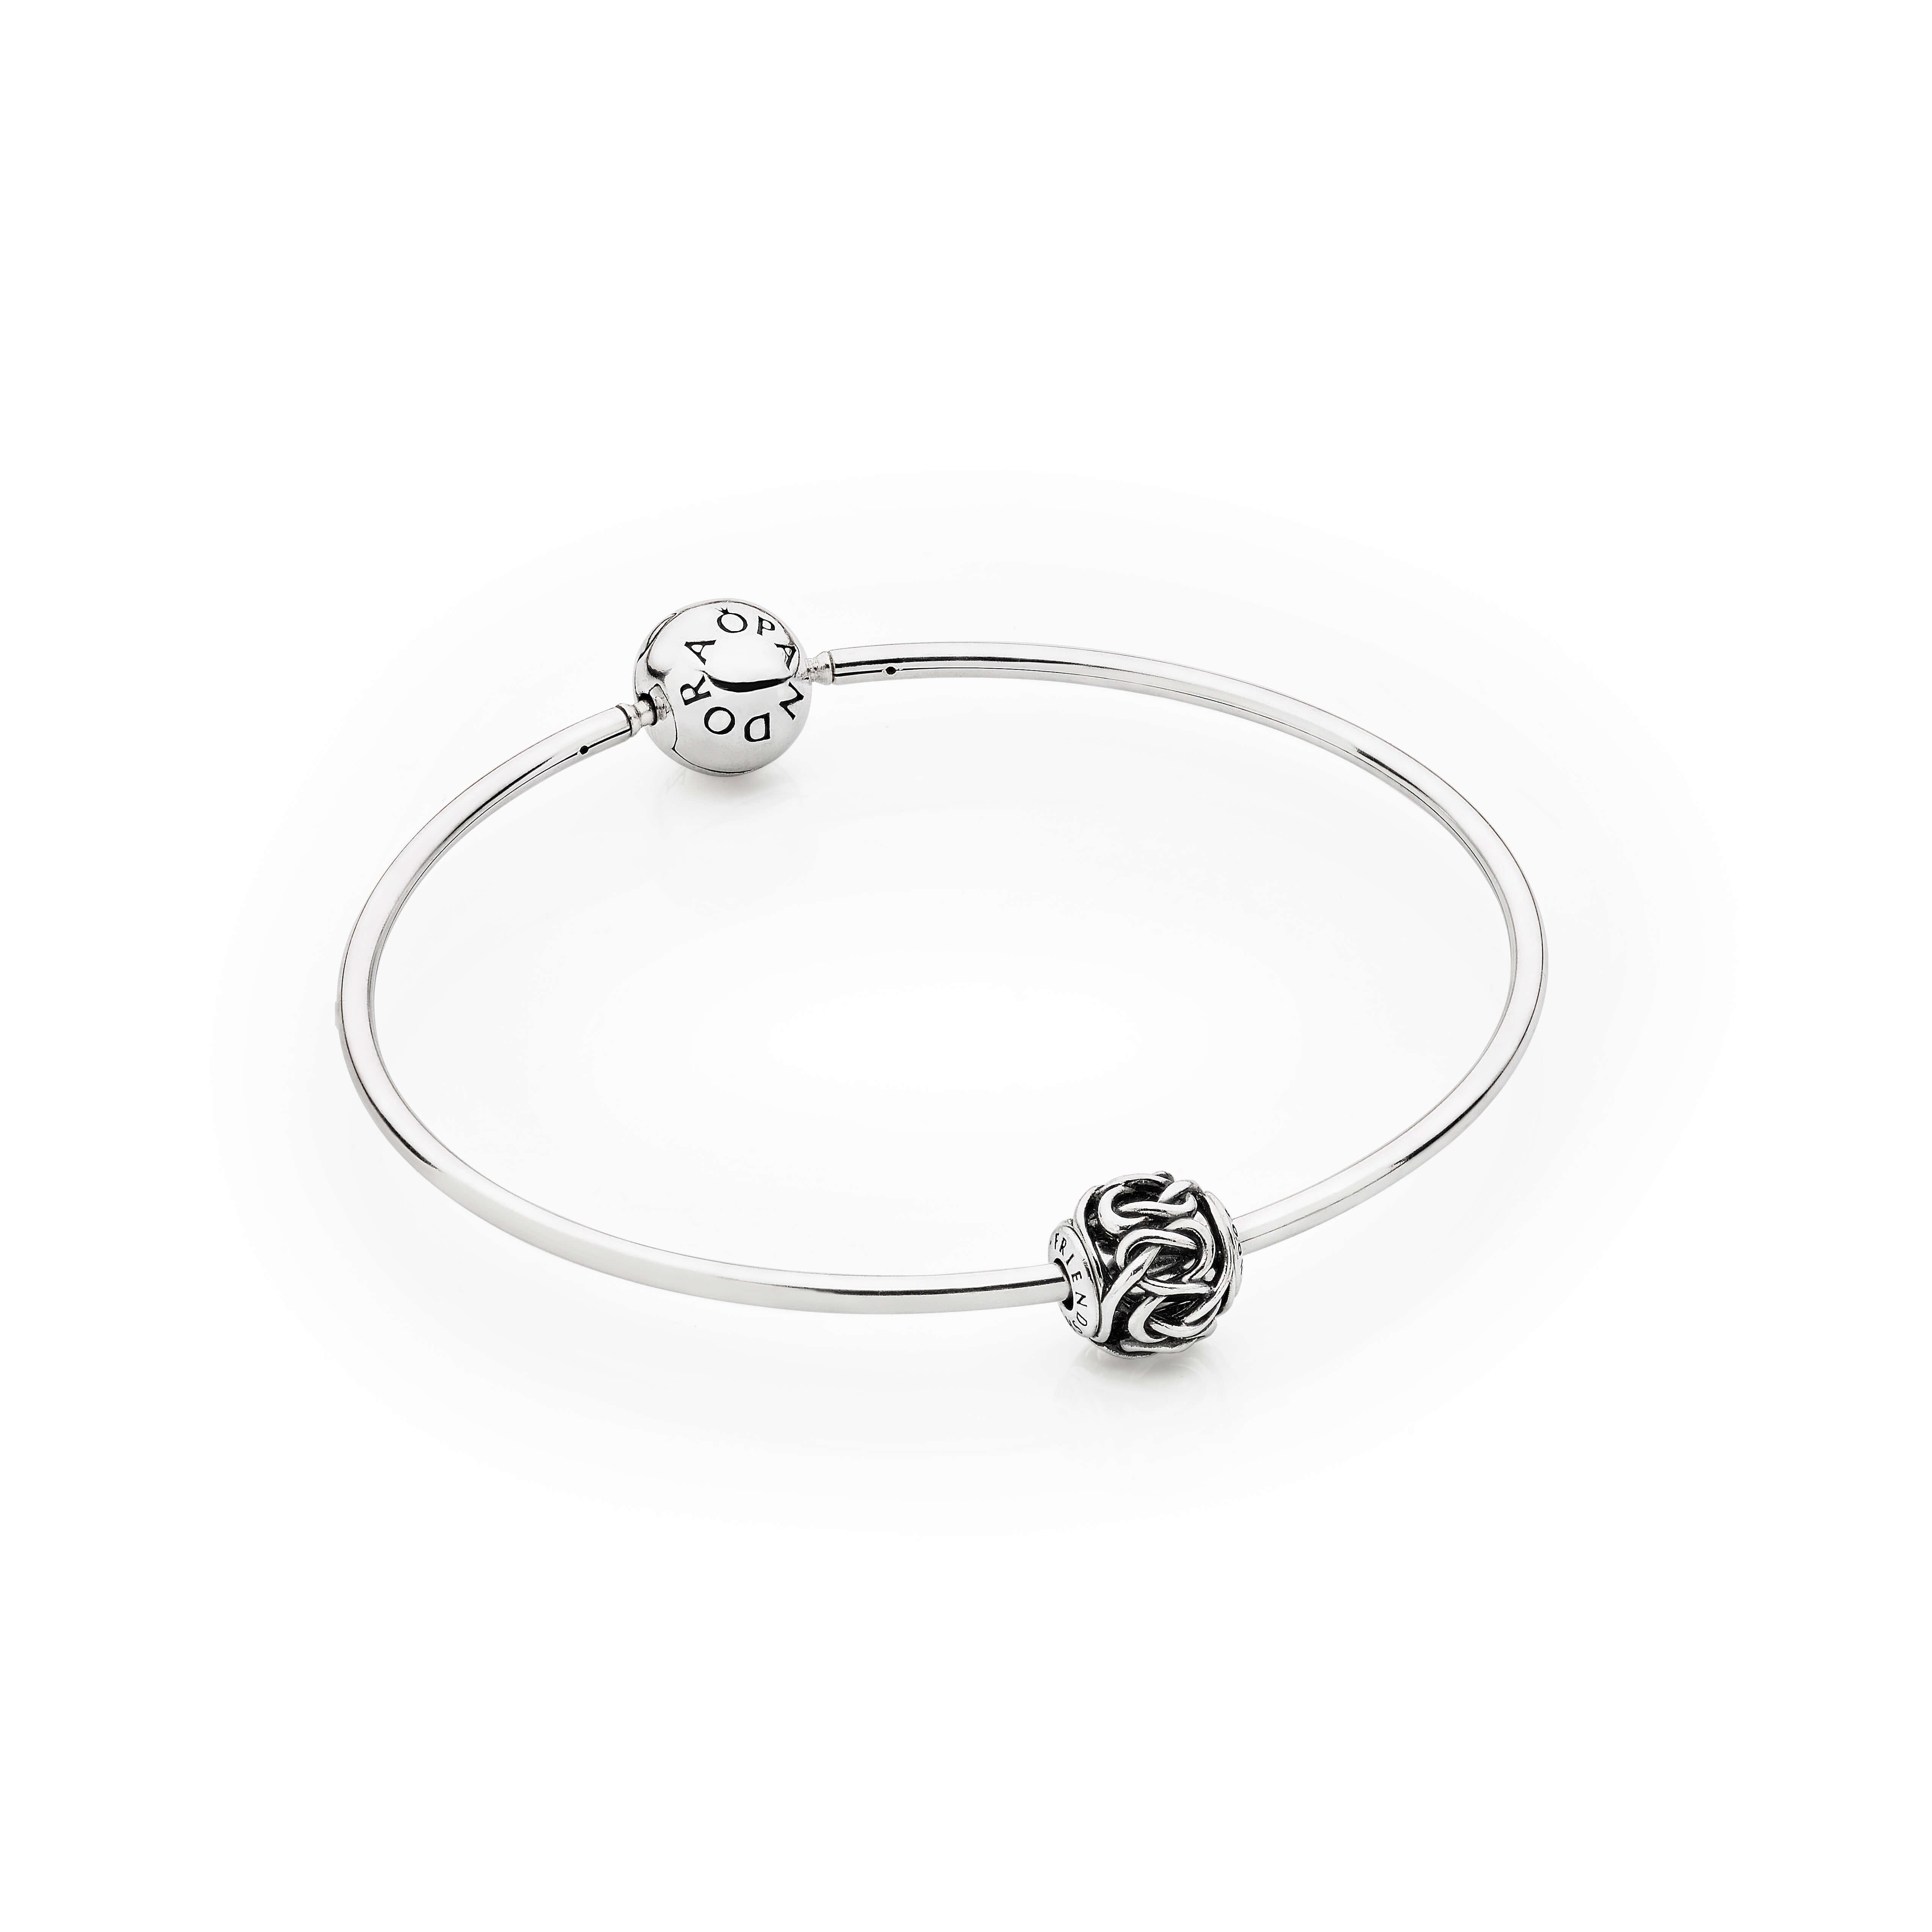 7040f29ed PANDORA ESSENCE Bangle Bracelet with FRIENDSHIP Charm - B800469-18 ...